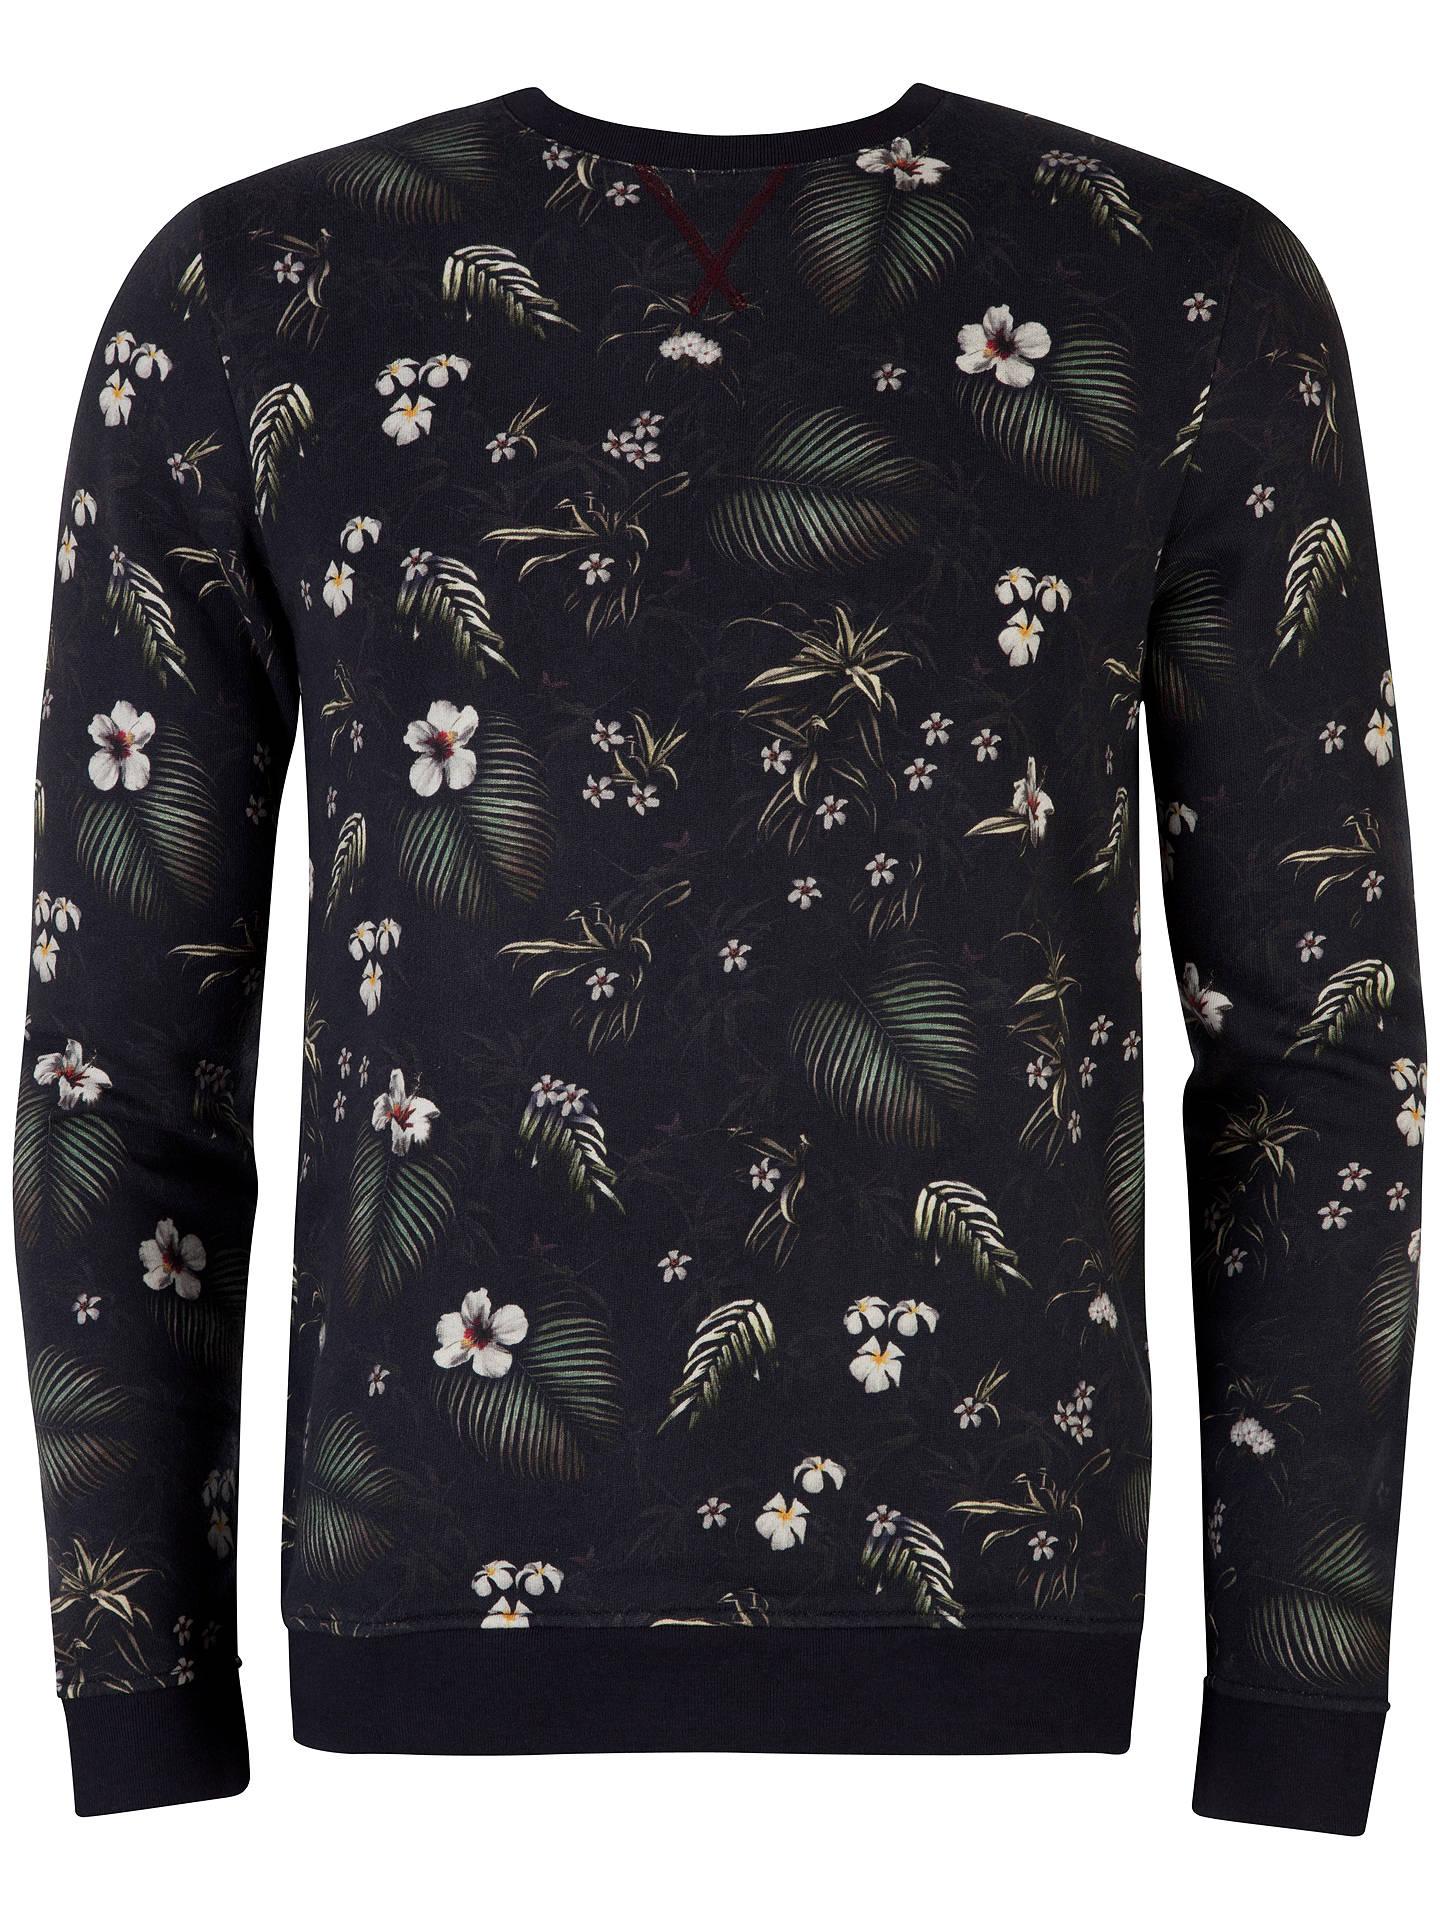 e62ce4f6733f BuyTed Baker Honesti Floral Printed Sweatshirt